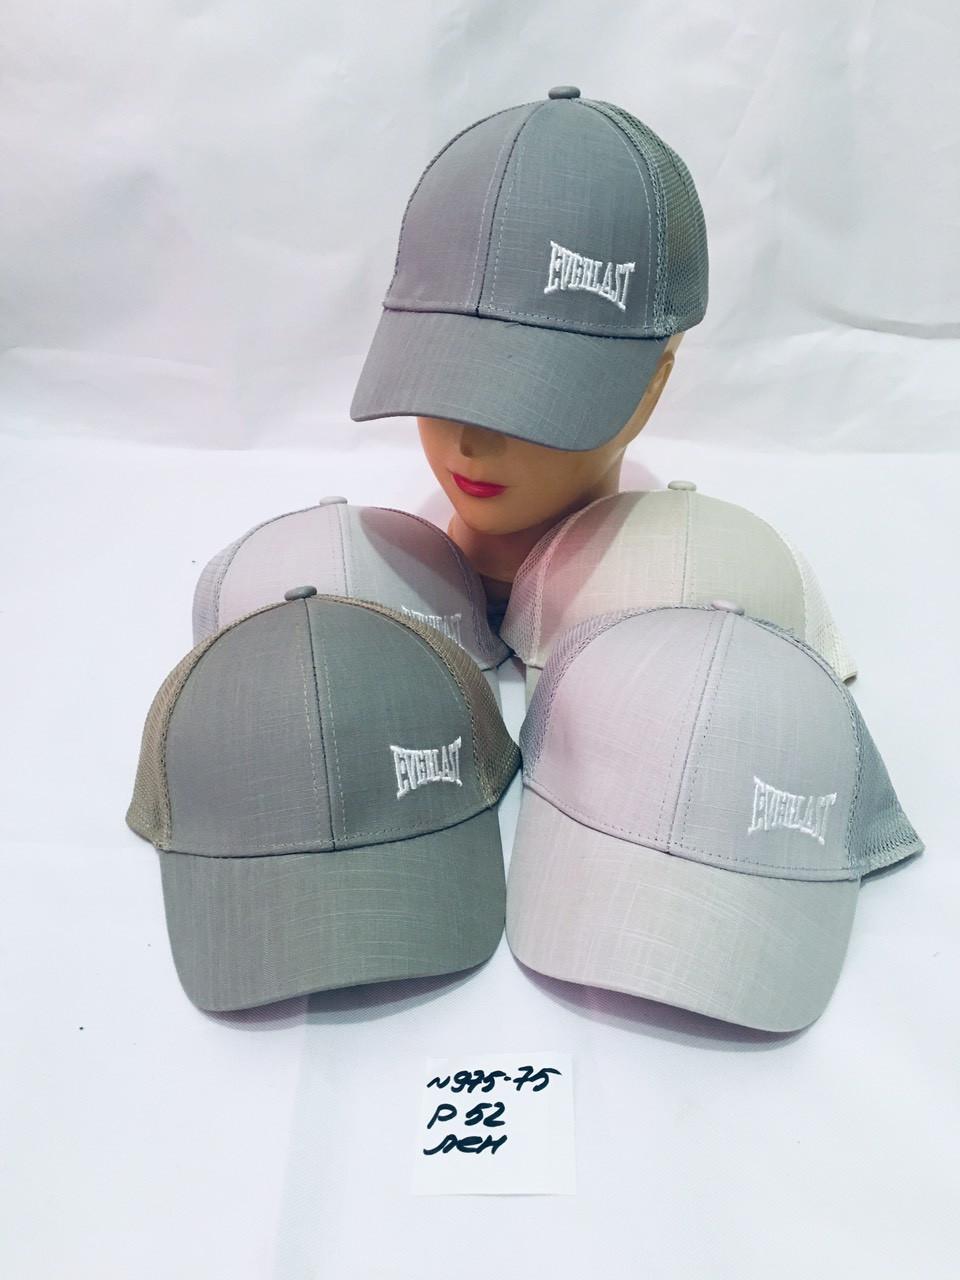 Летняя кепка для мальчика Everlast р.52 Лён